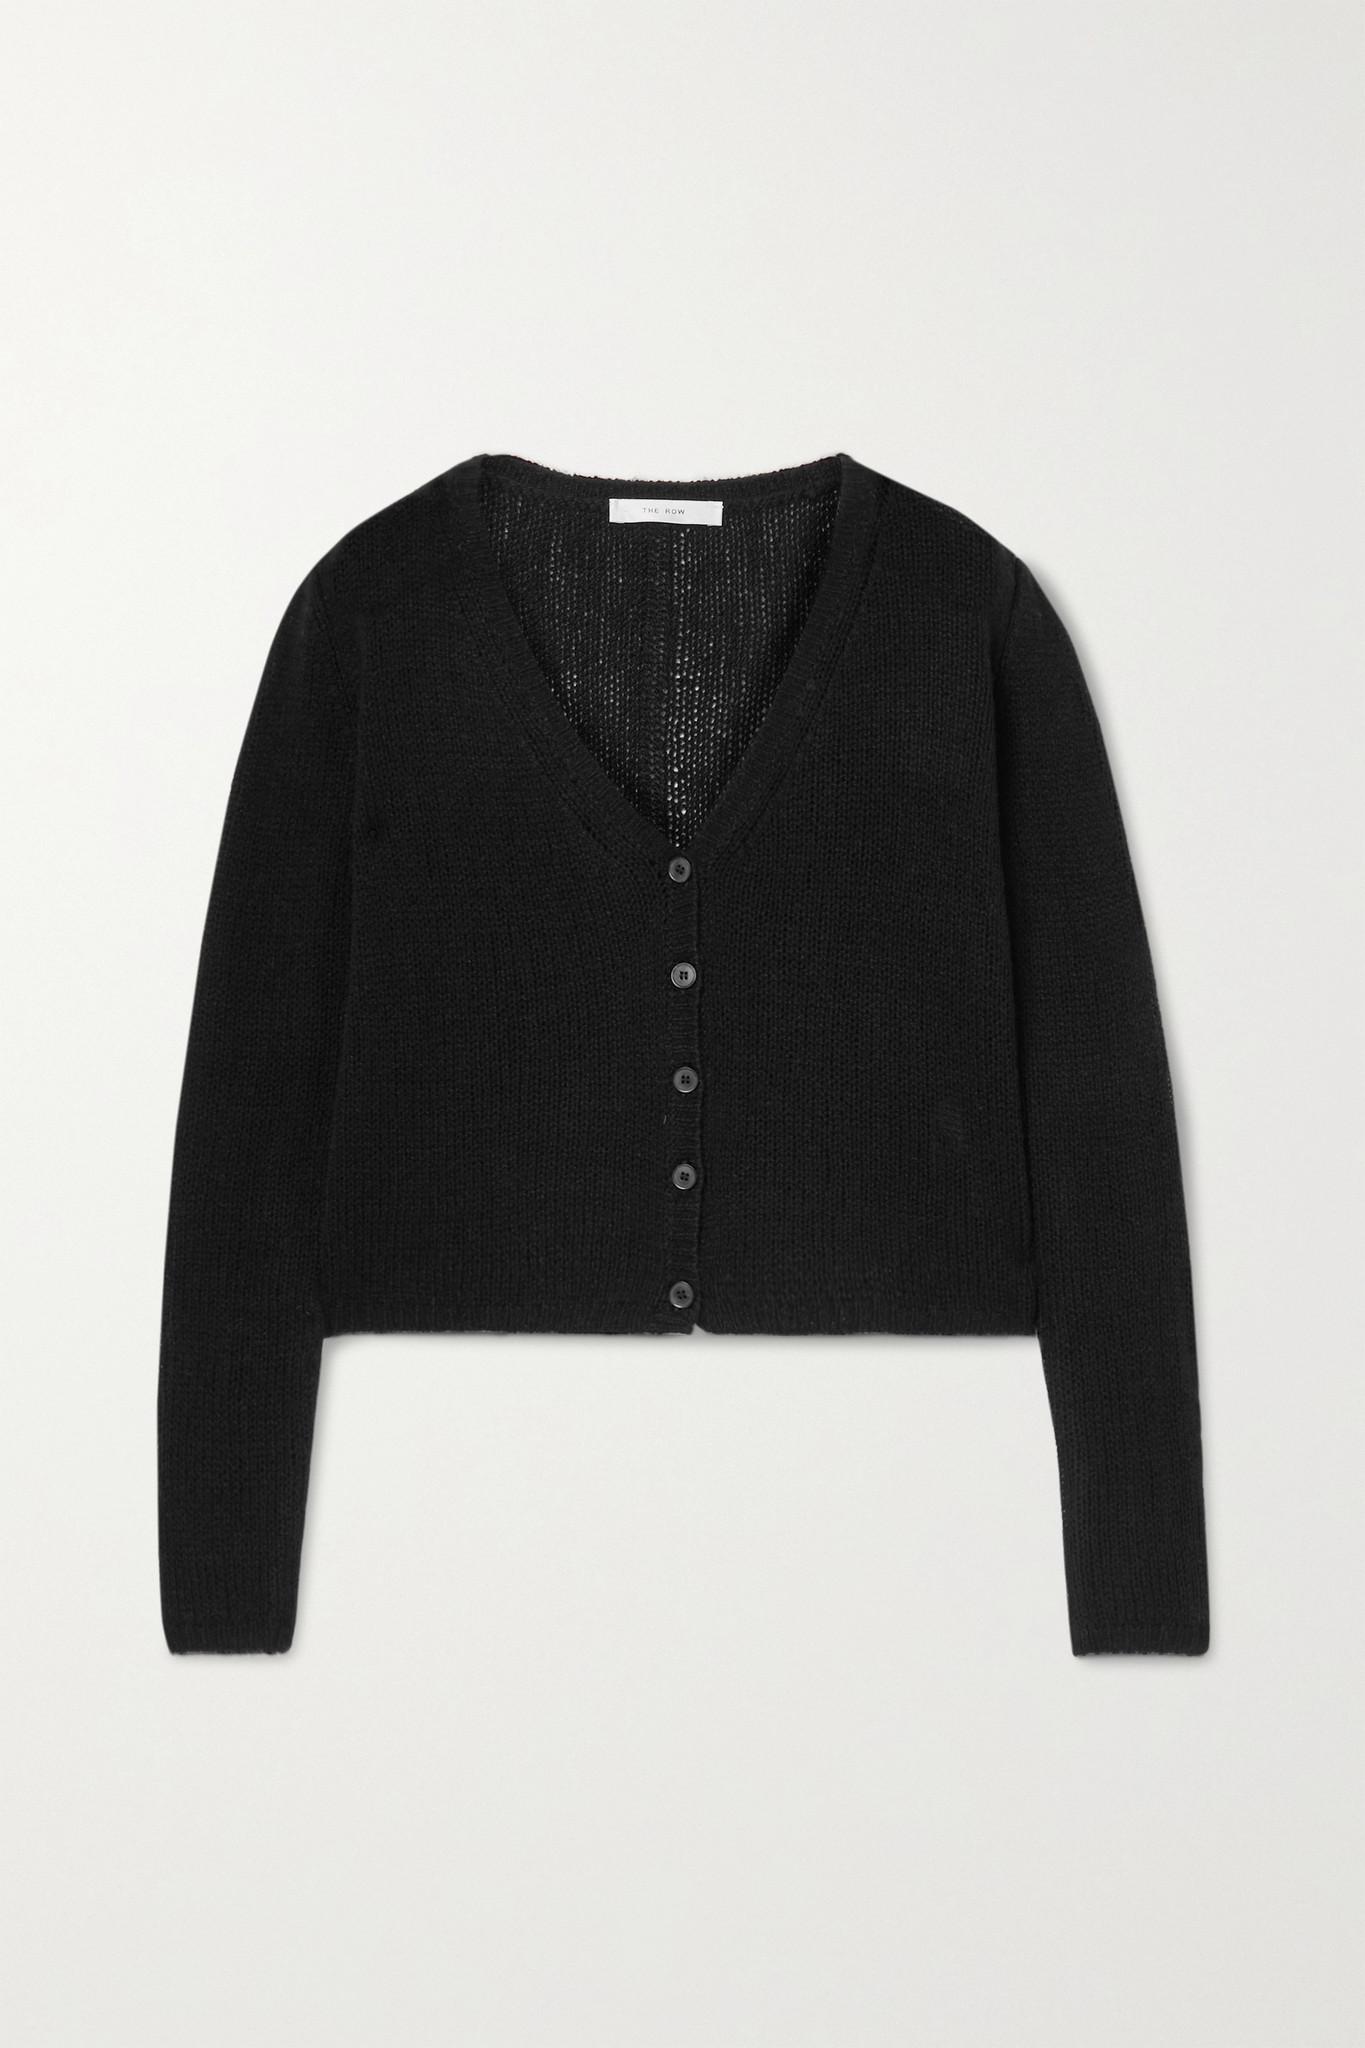 THE ROW - Abigael 羊绒短款开襟衫 - 黑色 - medium